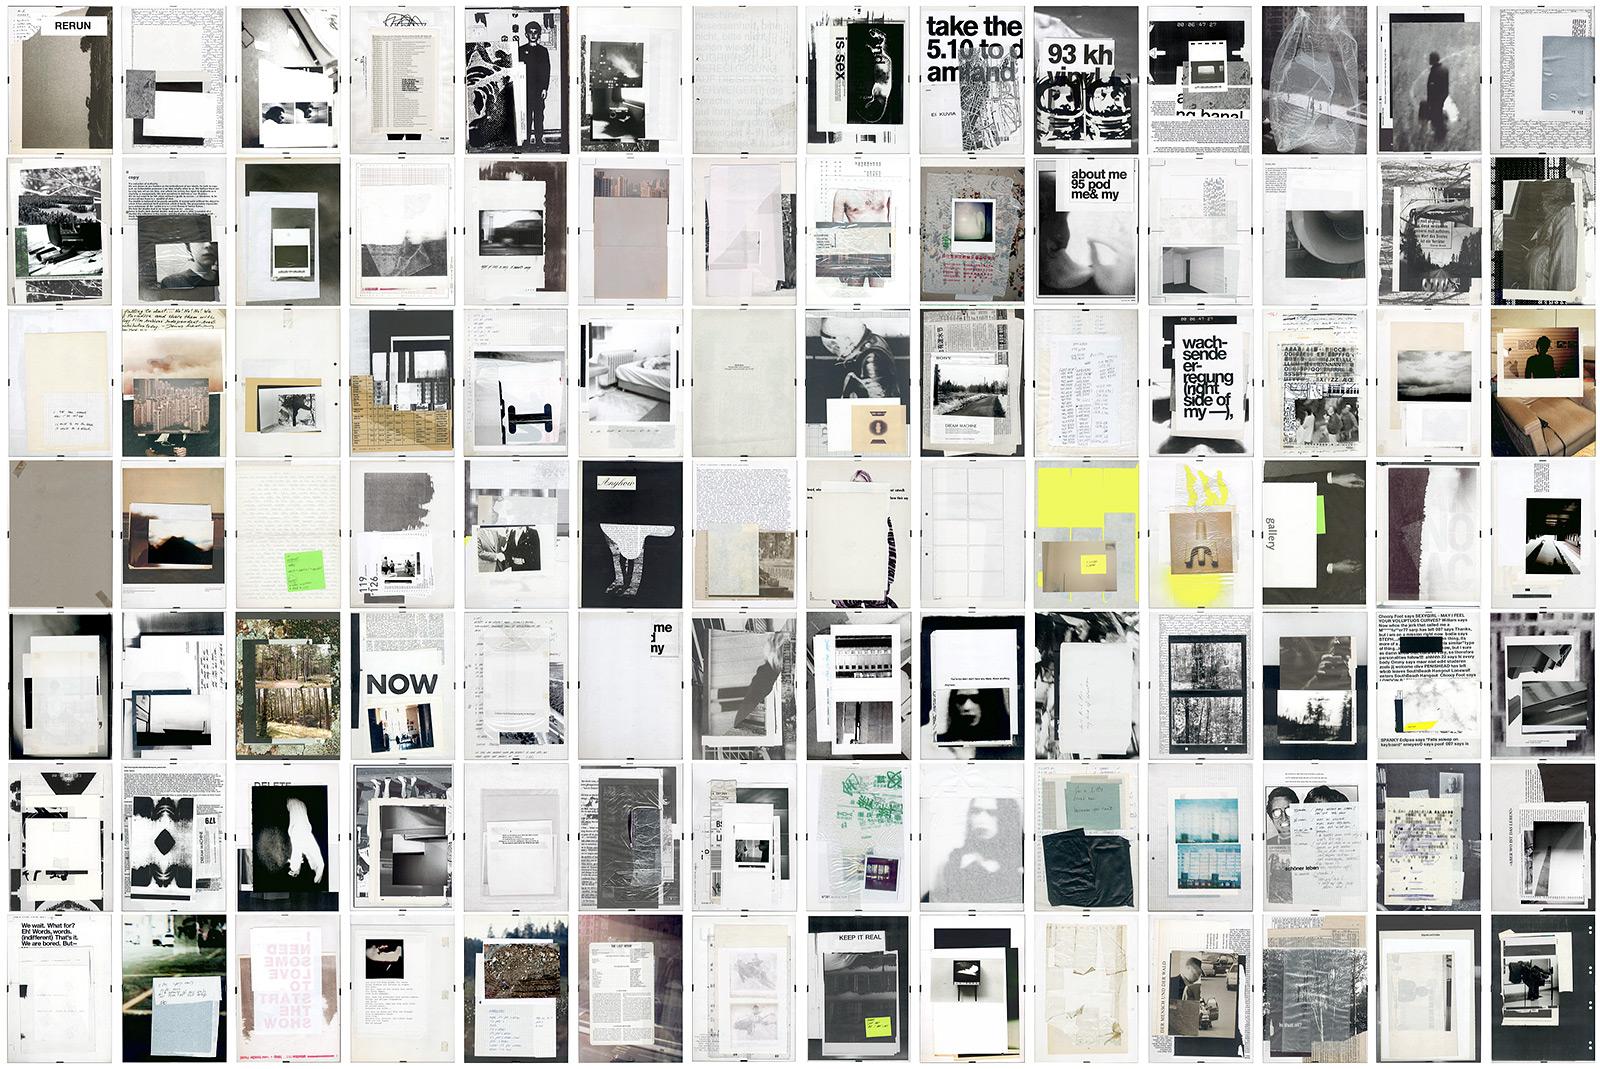 Esther Hunziker – The Wasted Documents Showbag Frames, 2010-2014